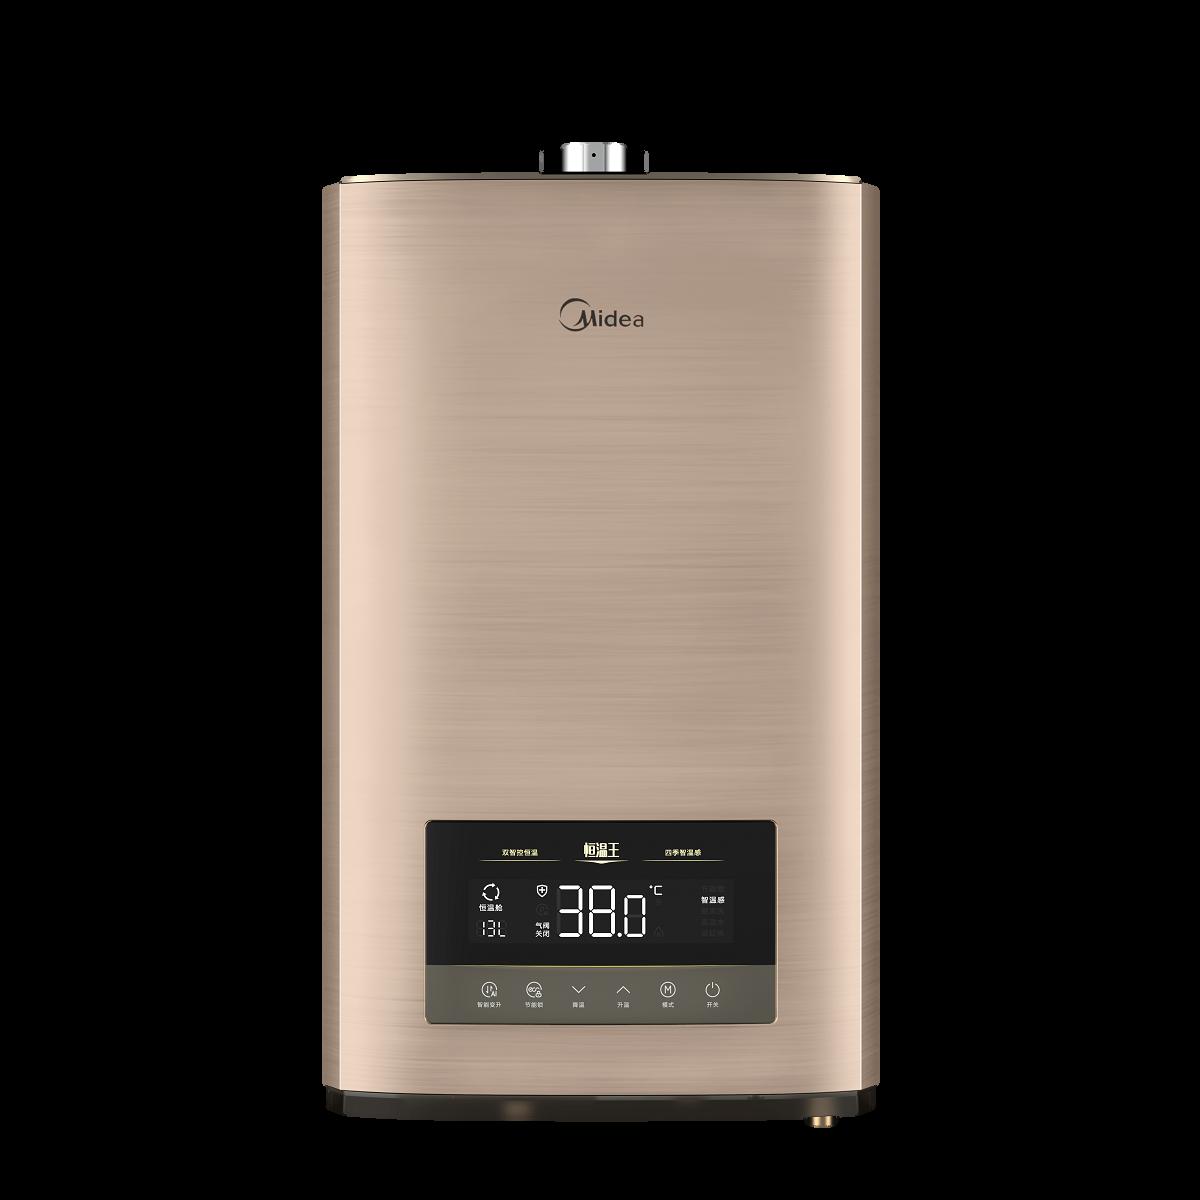 Midea/美的 JSQ30-16HL7燃气热水器 说明书.pdf